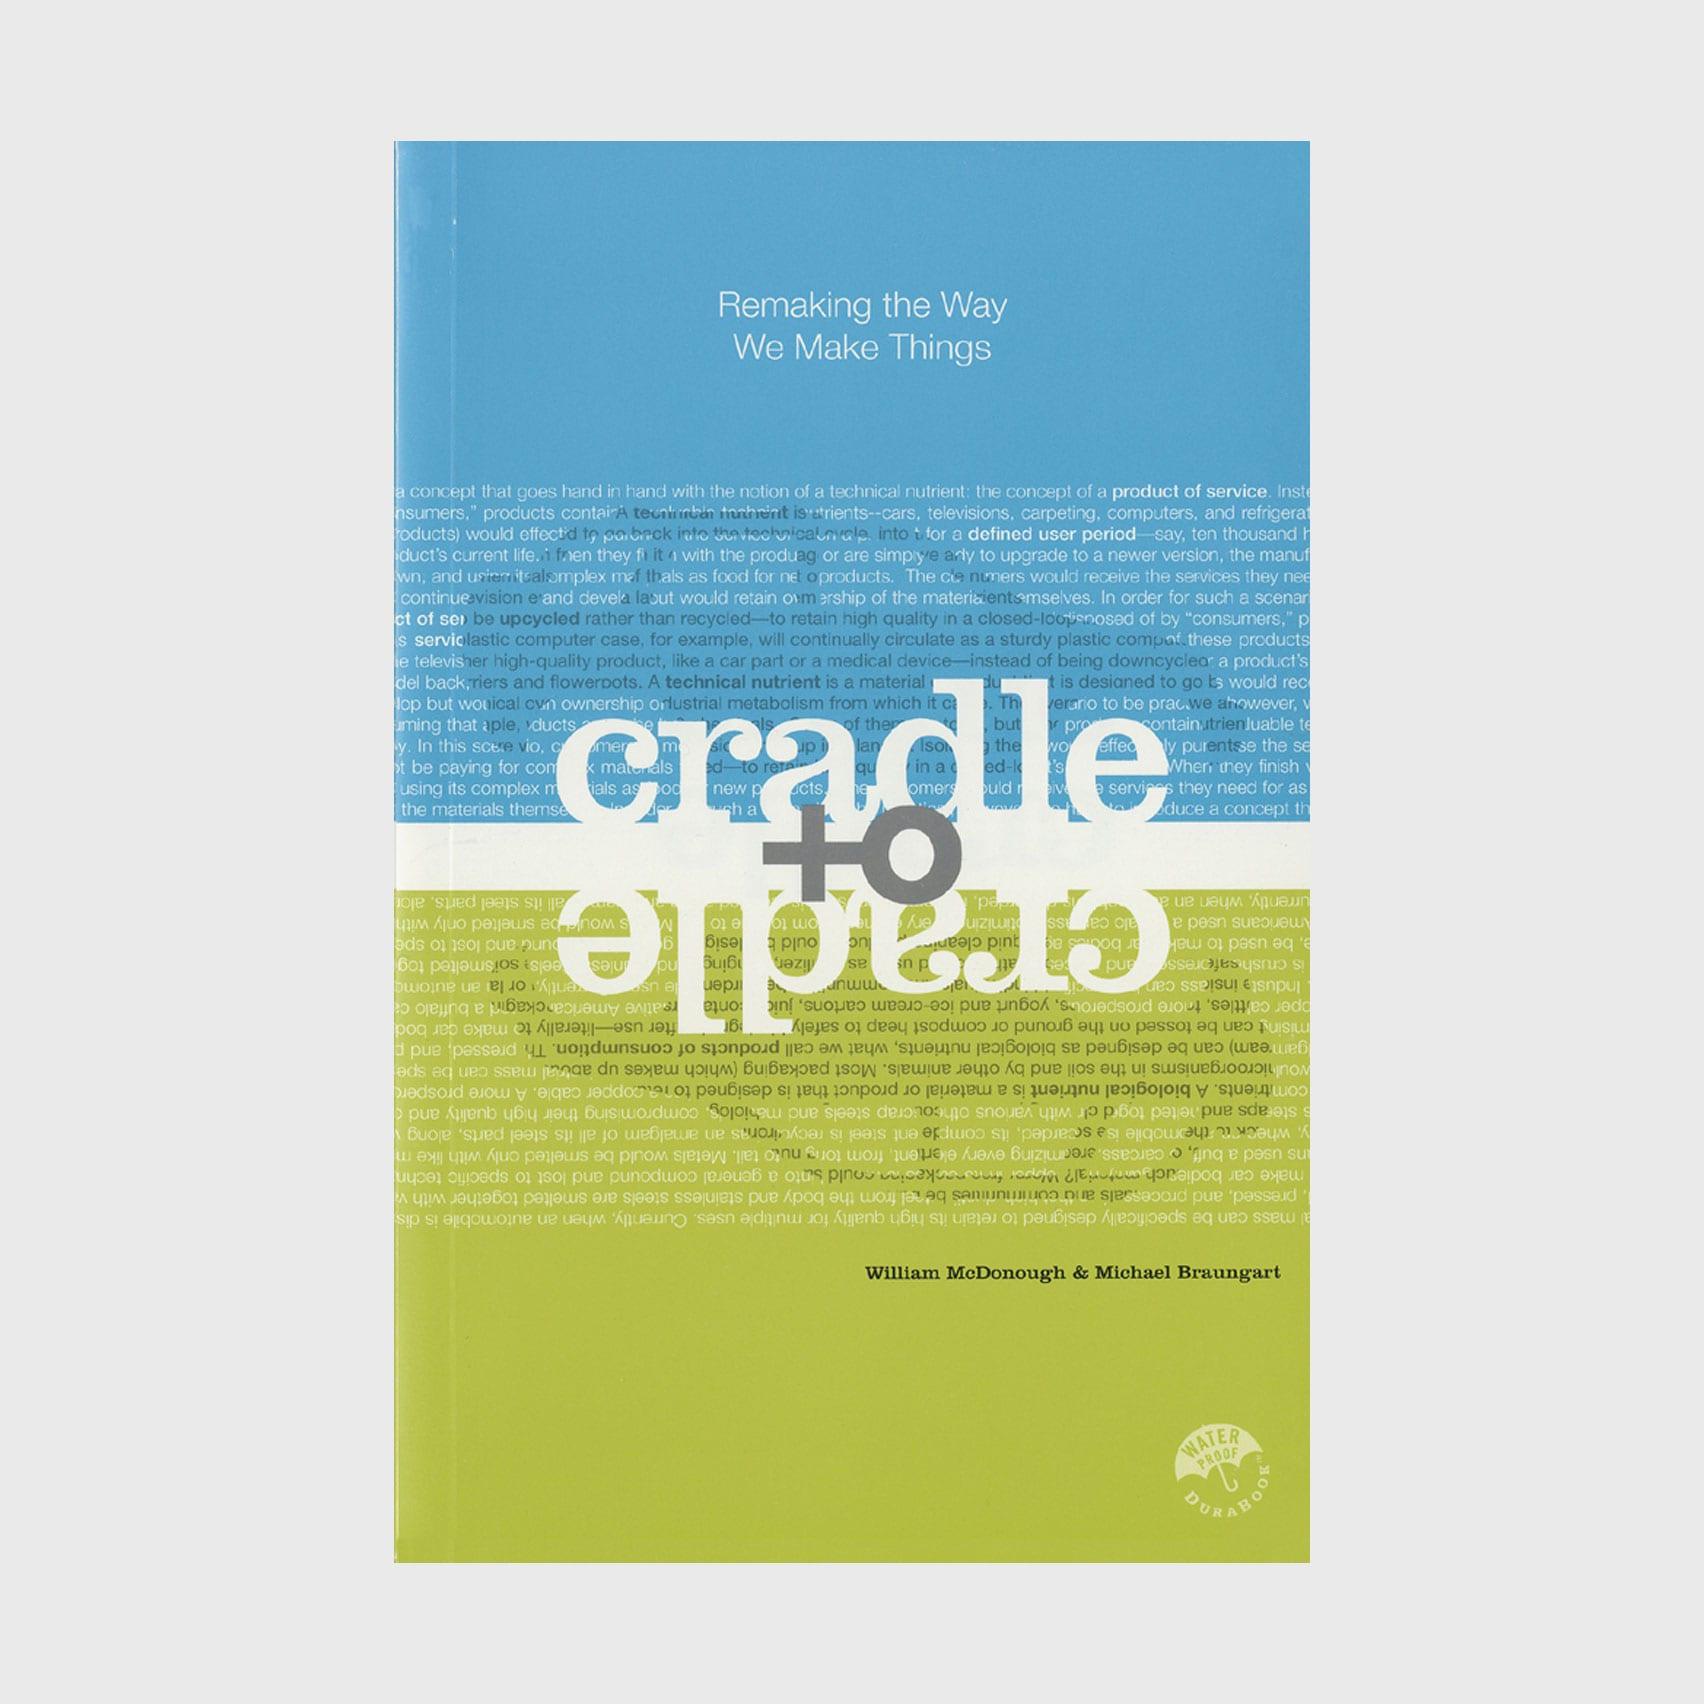 Cradle to Cradle book cover